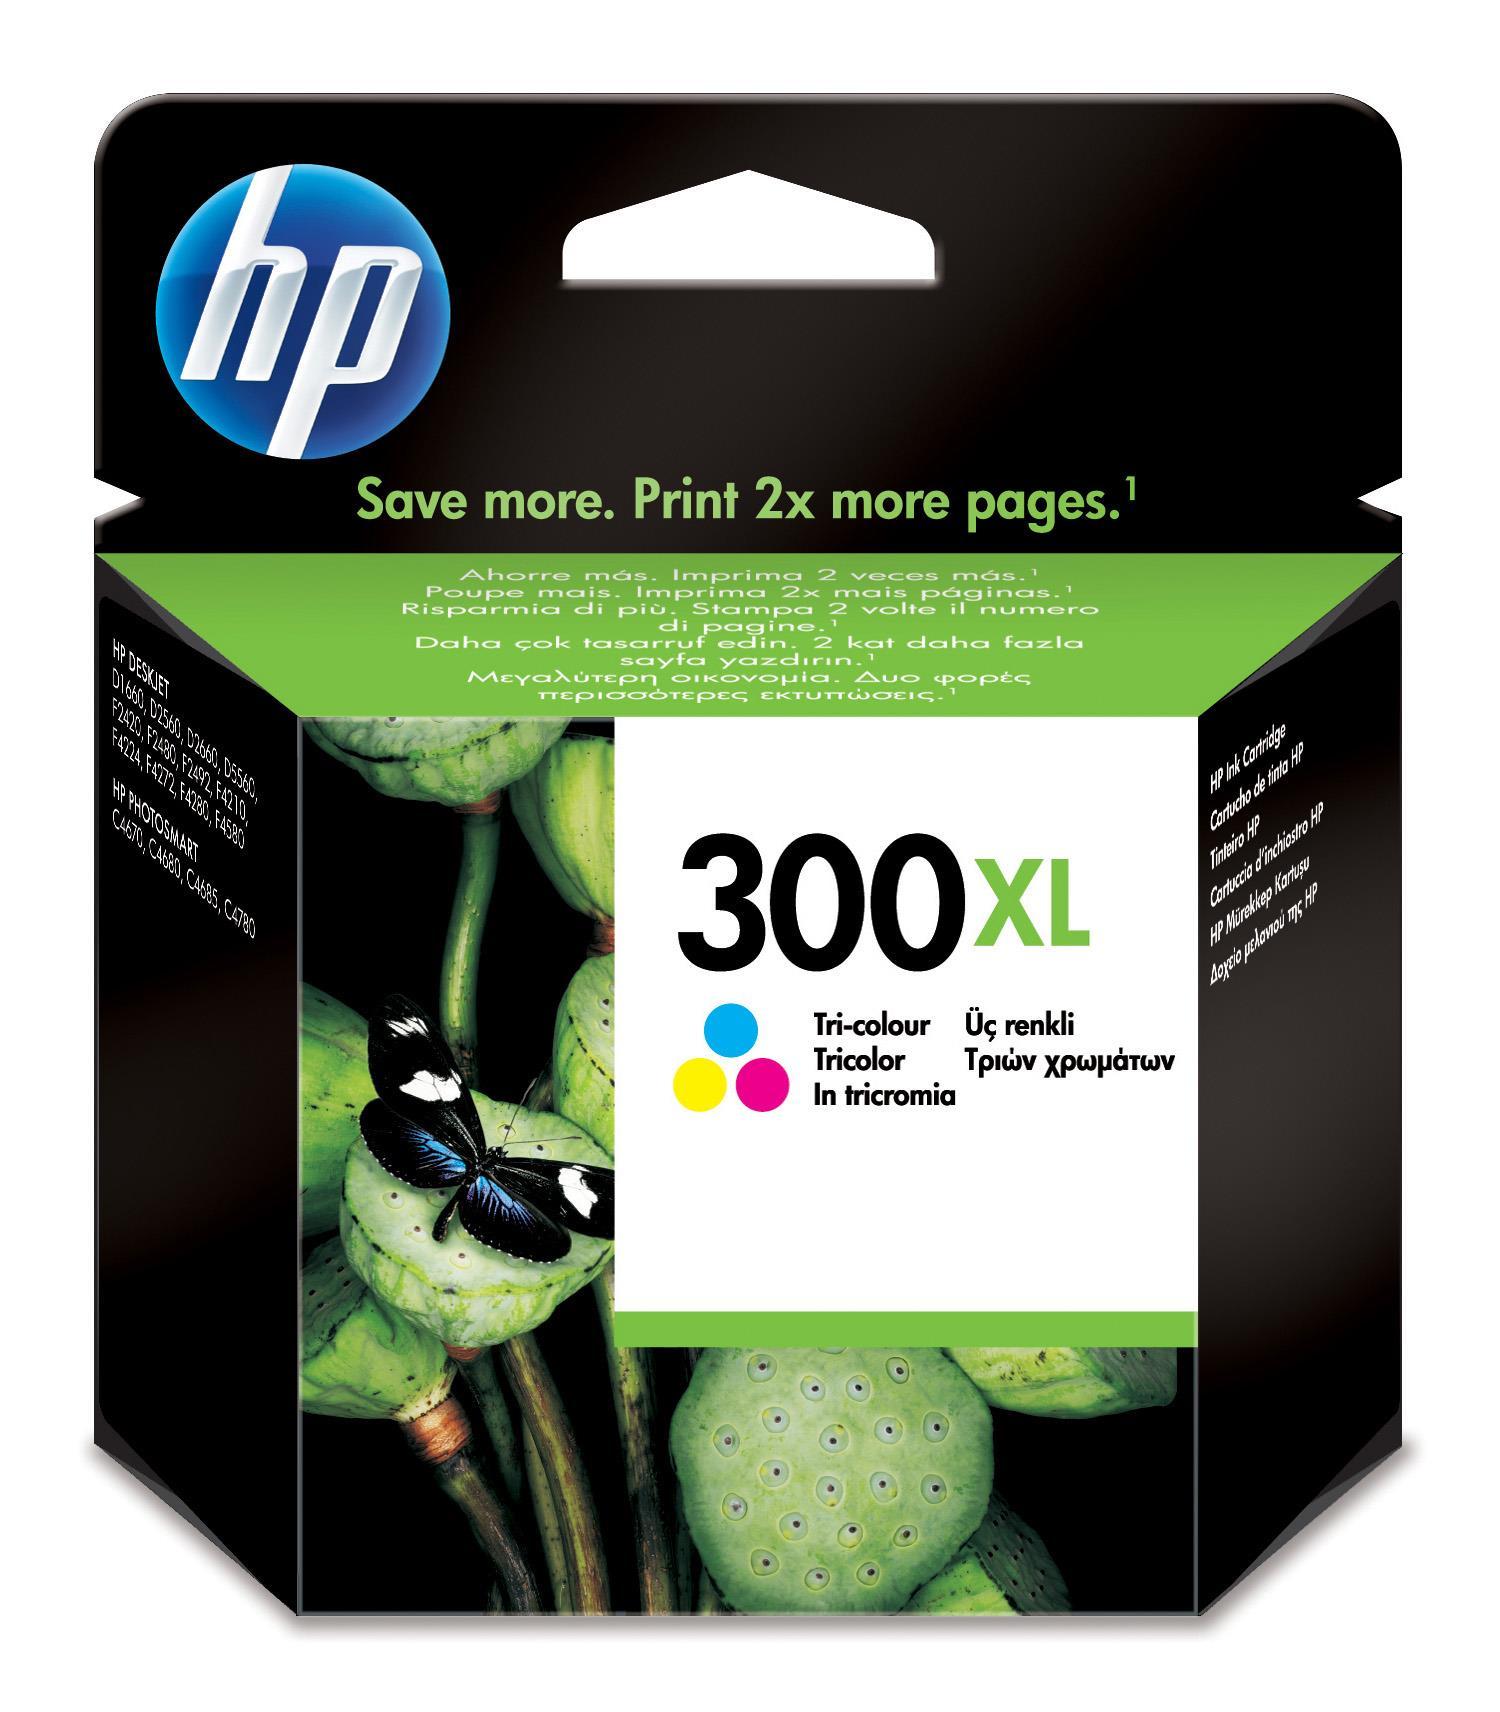 HP 300XL (Yield: 440 Pages) Cyan/Magenta/Yellow Ink Cartridge